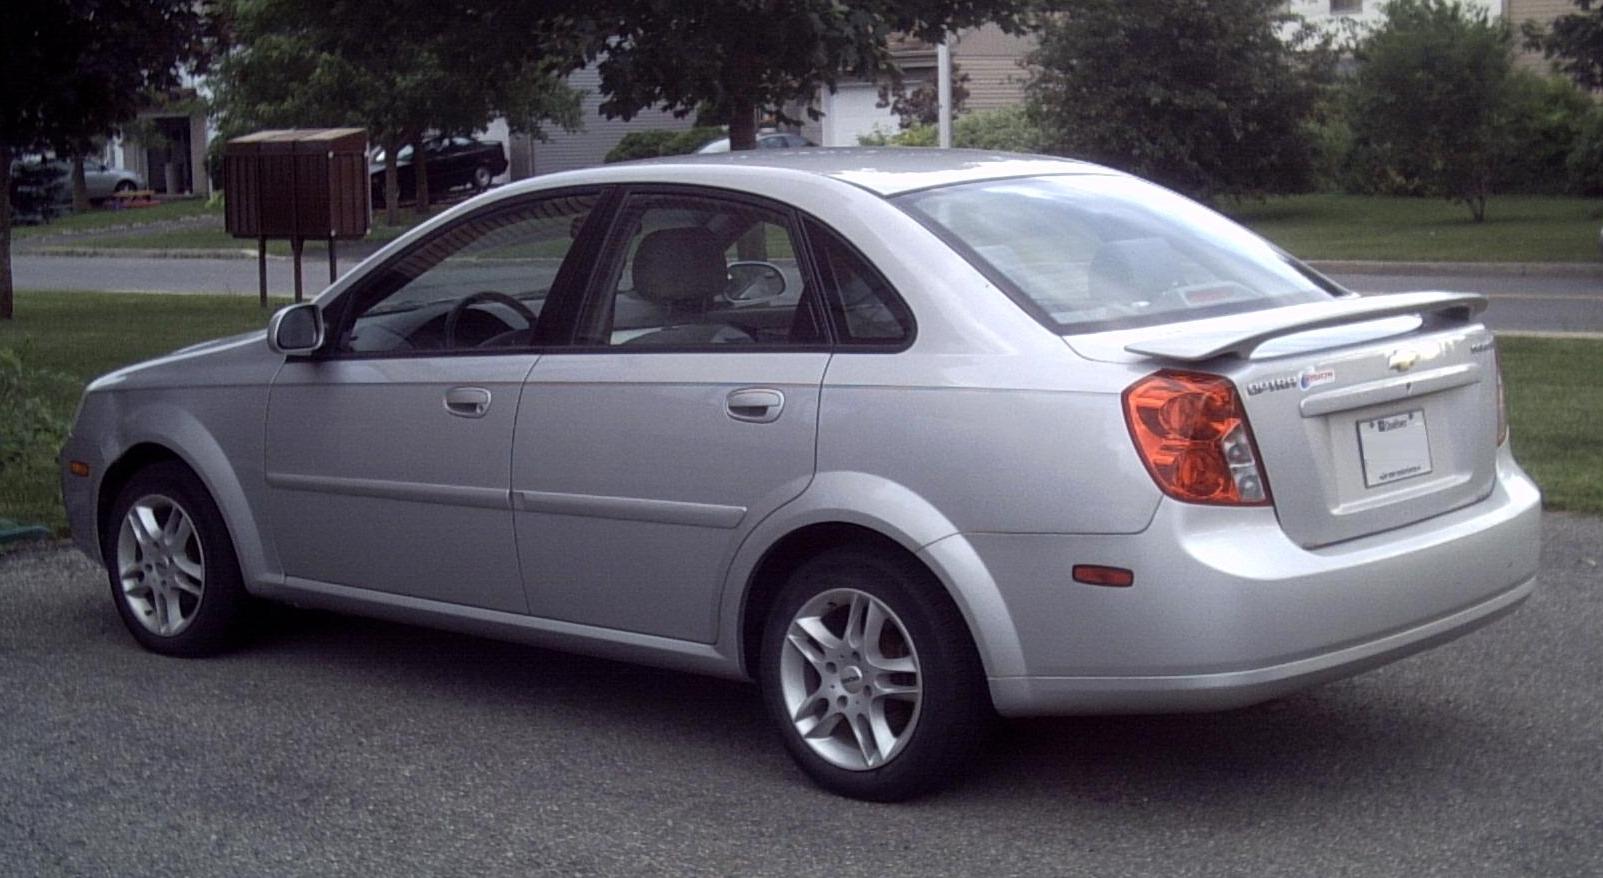 File:Chevrolet Optra 2004-05.JPG - Wikimedia Commons